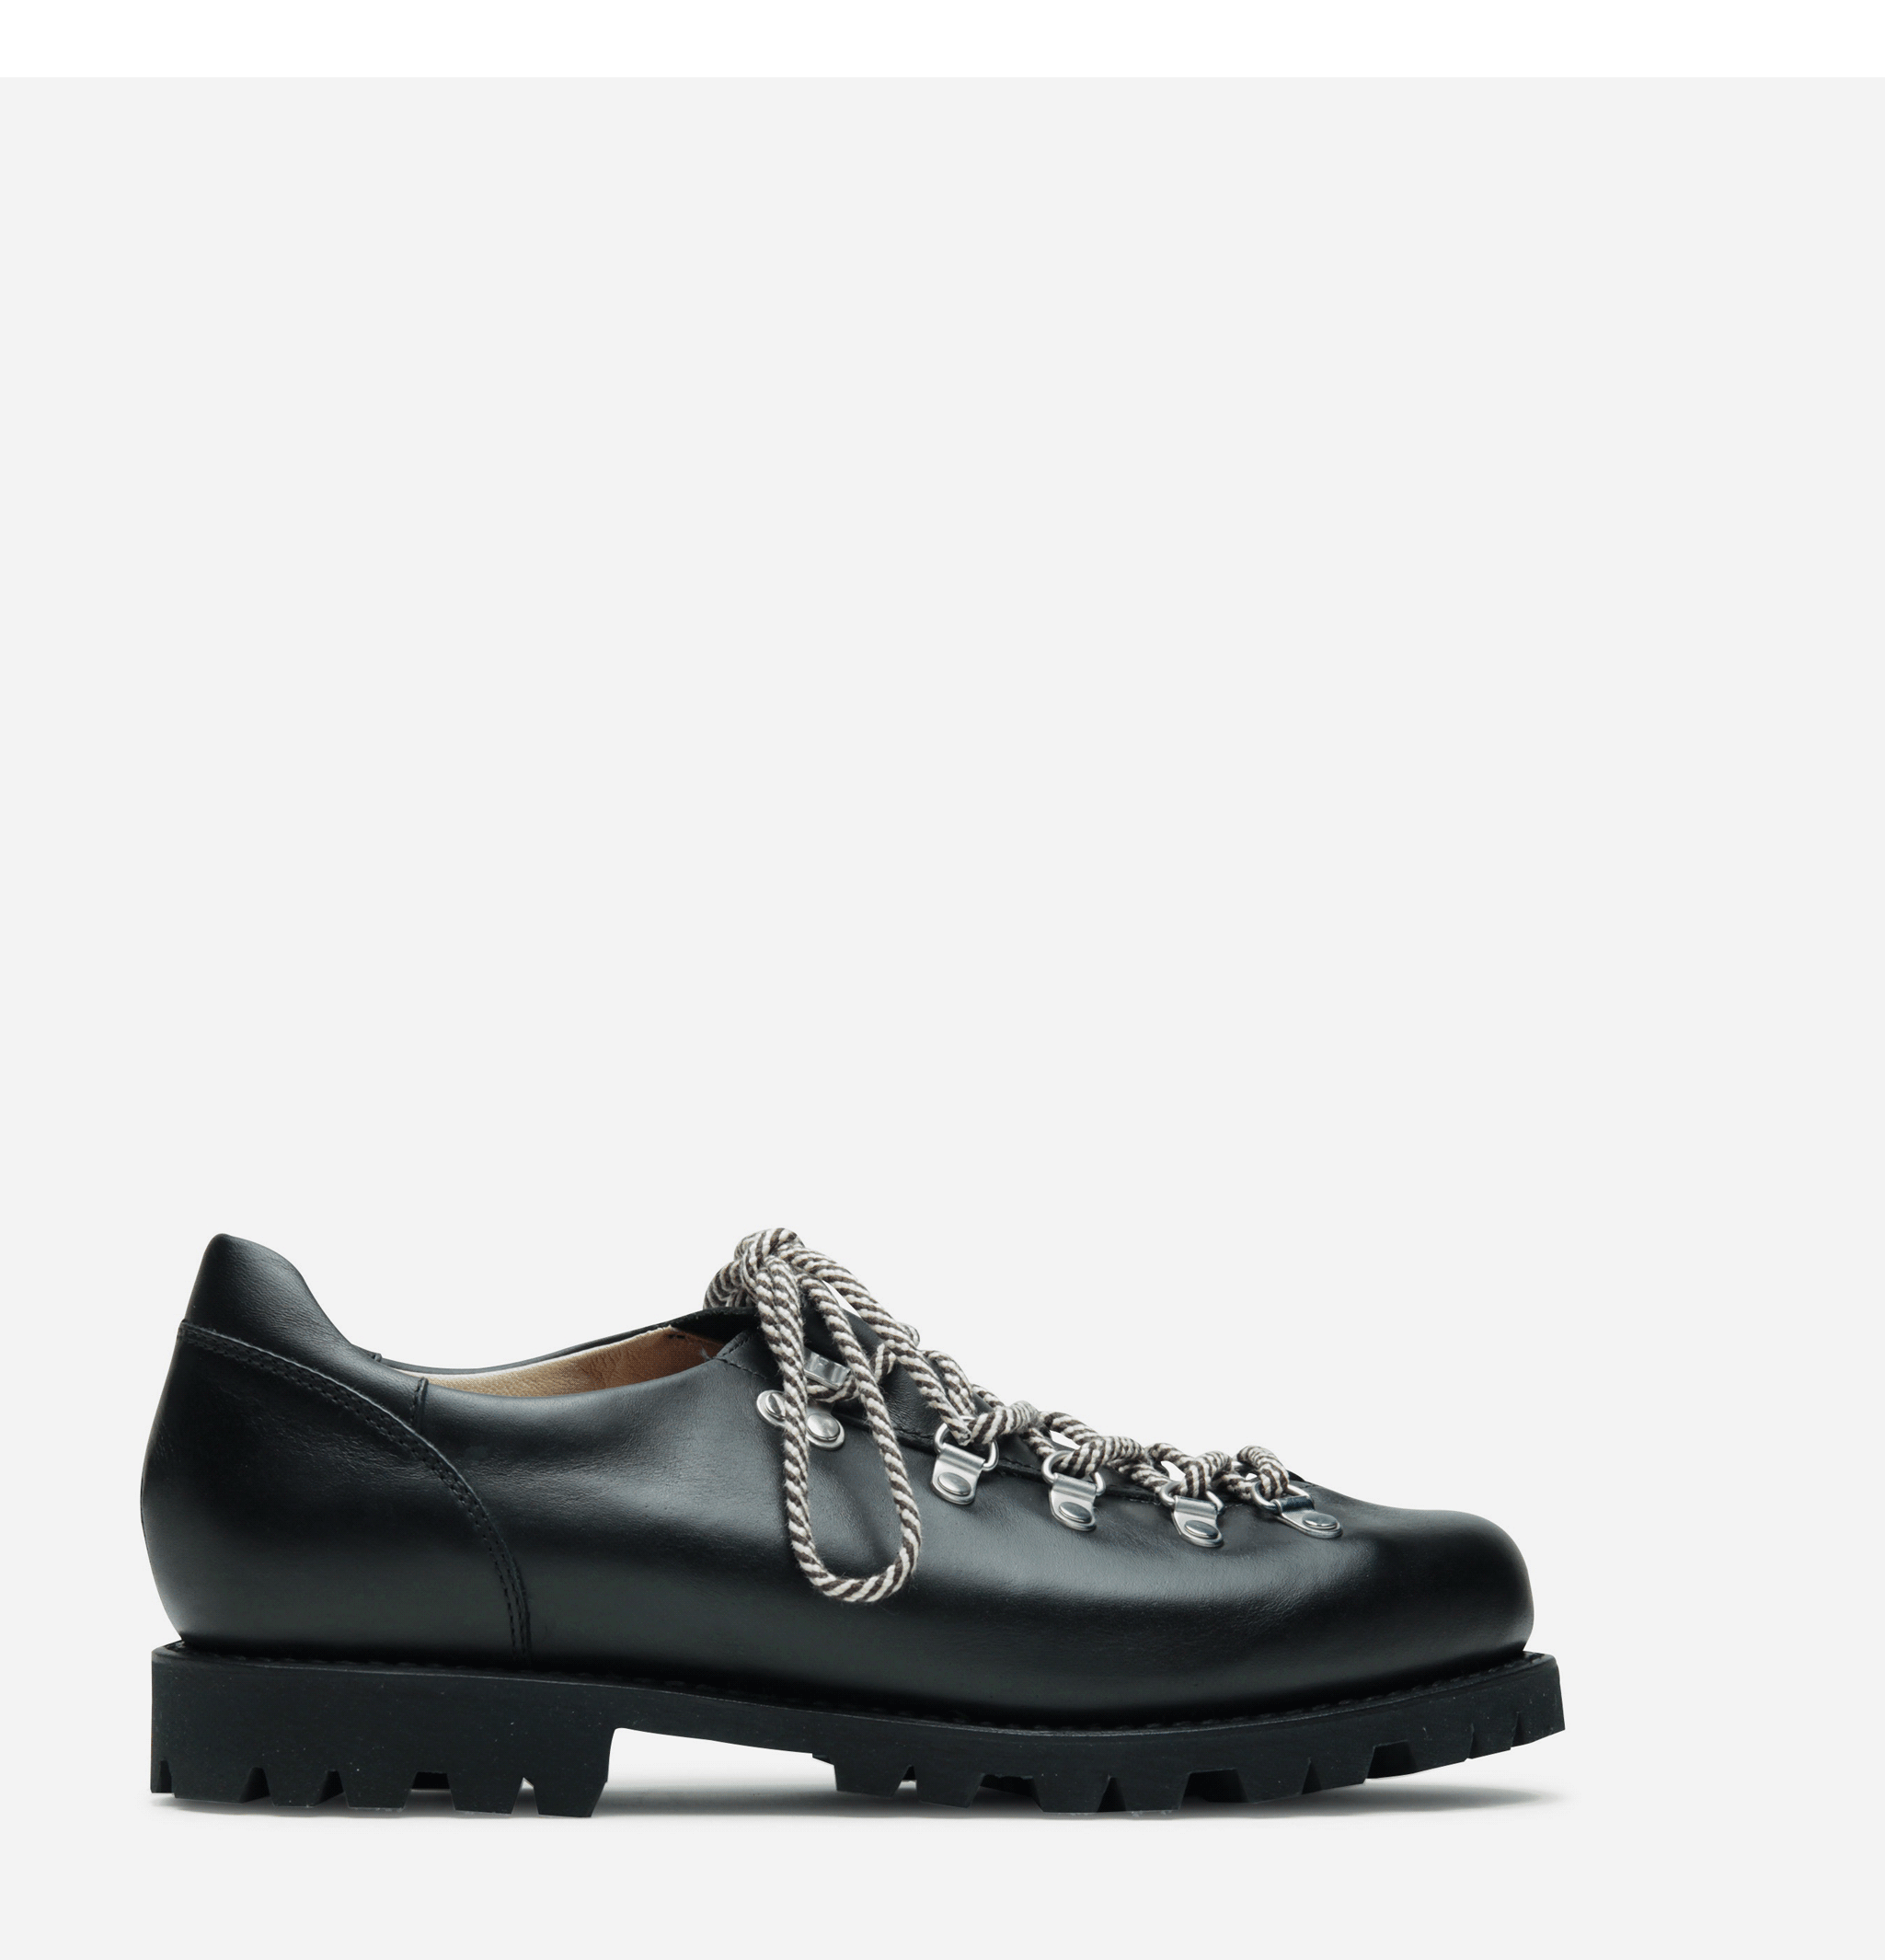 Chaussure Clusaz Noir